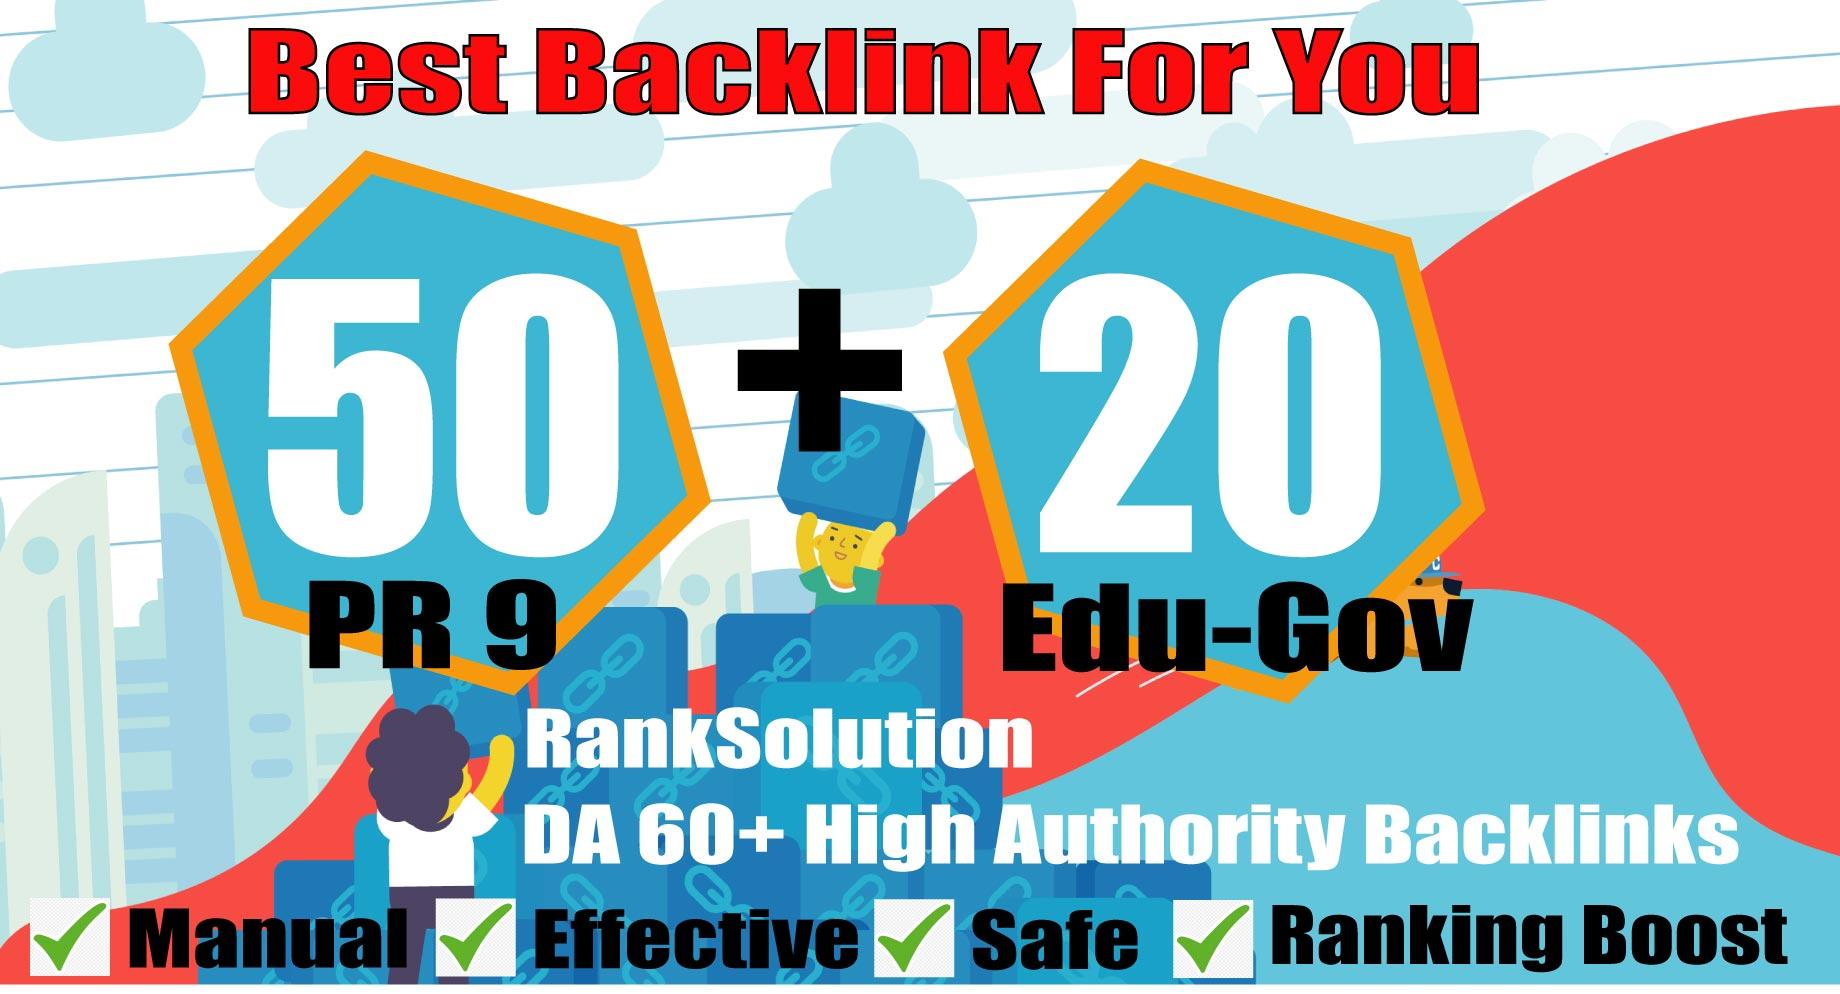 manually do 50 PR9+ 20 EDU-GOV Backlinks From Authority Domains